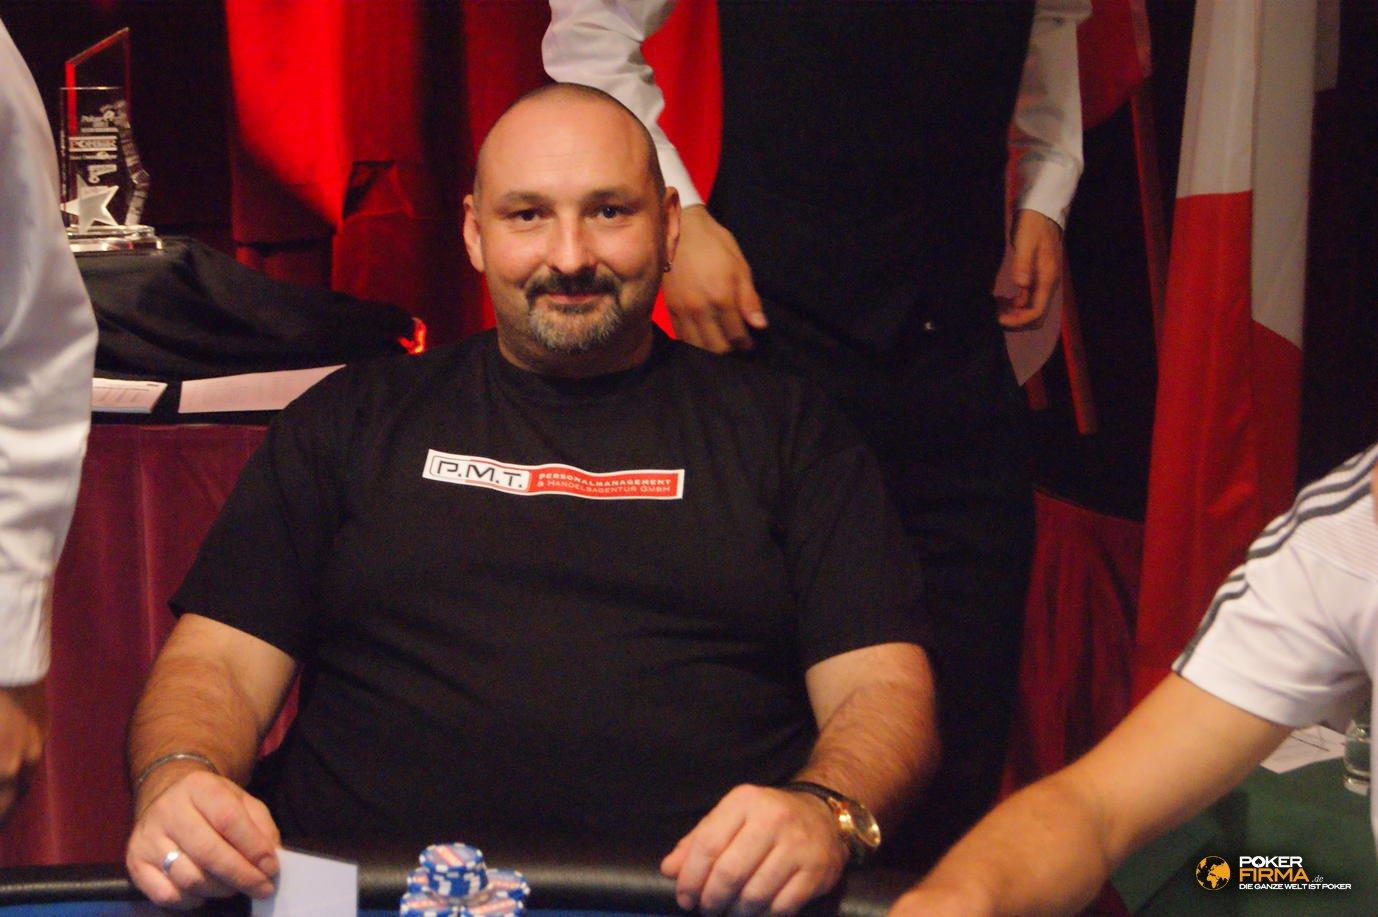 Poker_EM_2000_NLH_FT_271011_Guenter_Gas